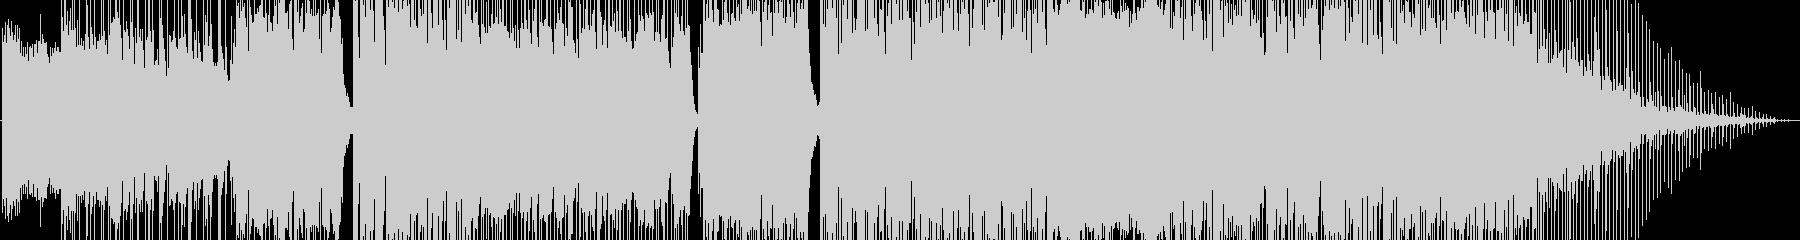 Fadeの未再生の波形